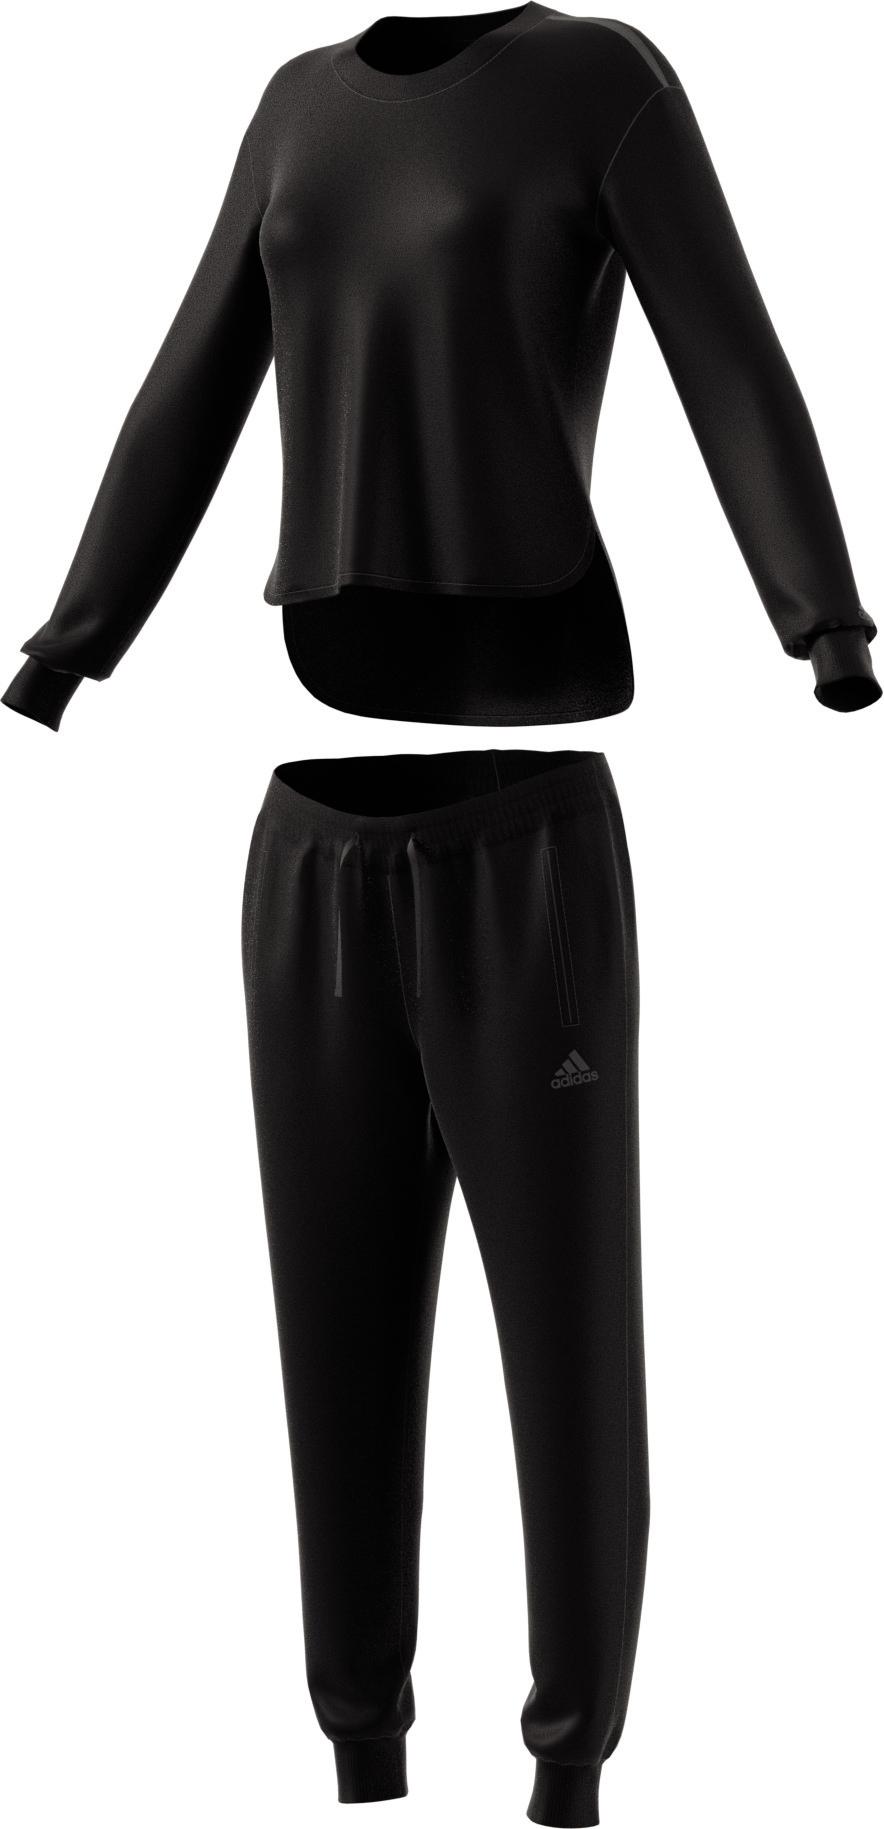 Damen Trainingsanzug CHILL OUT TRACKSUIT, BLACK, L